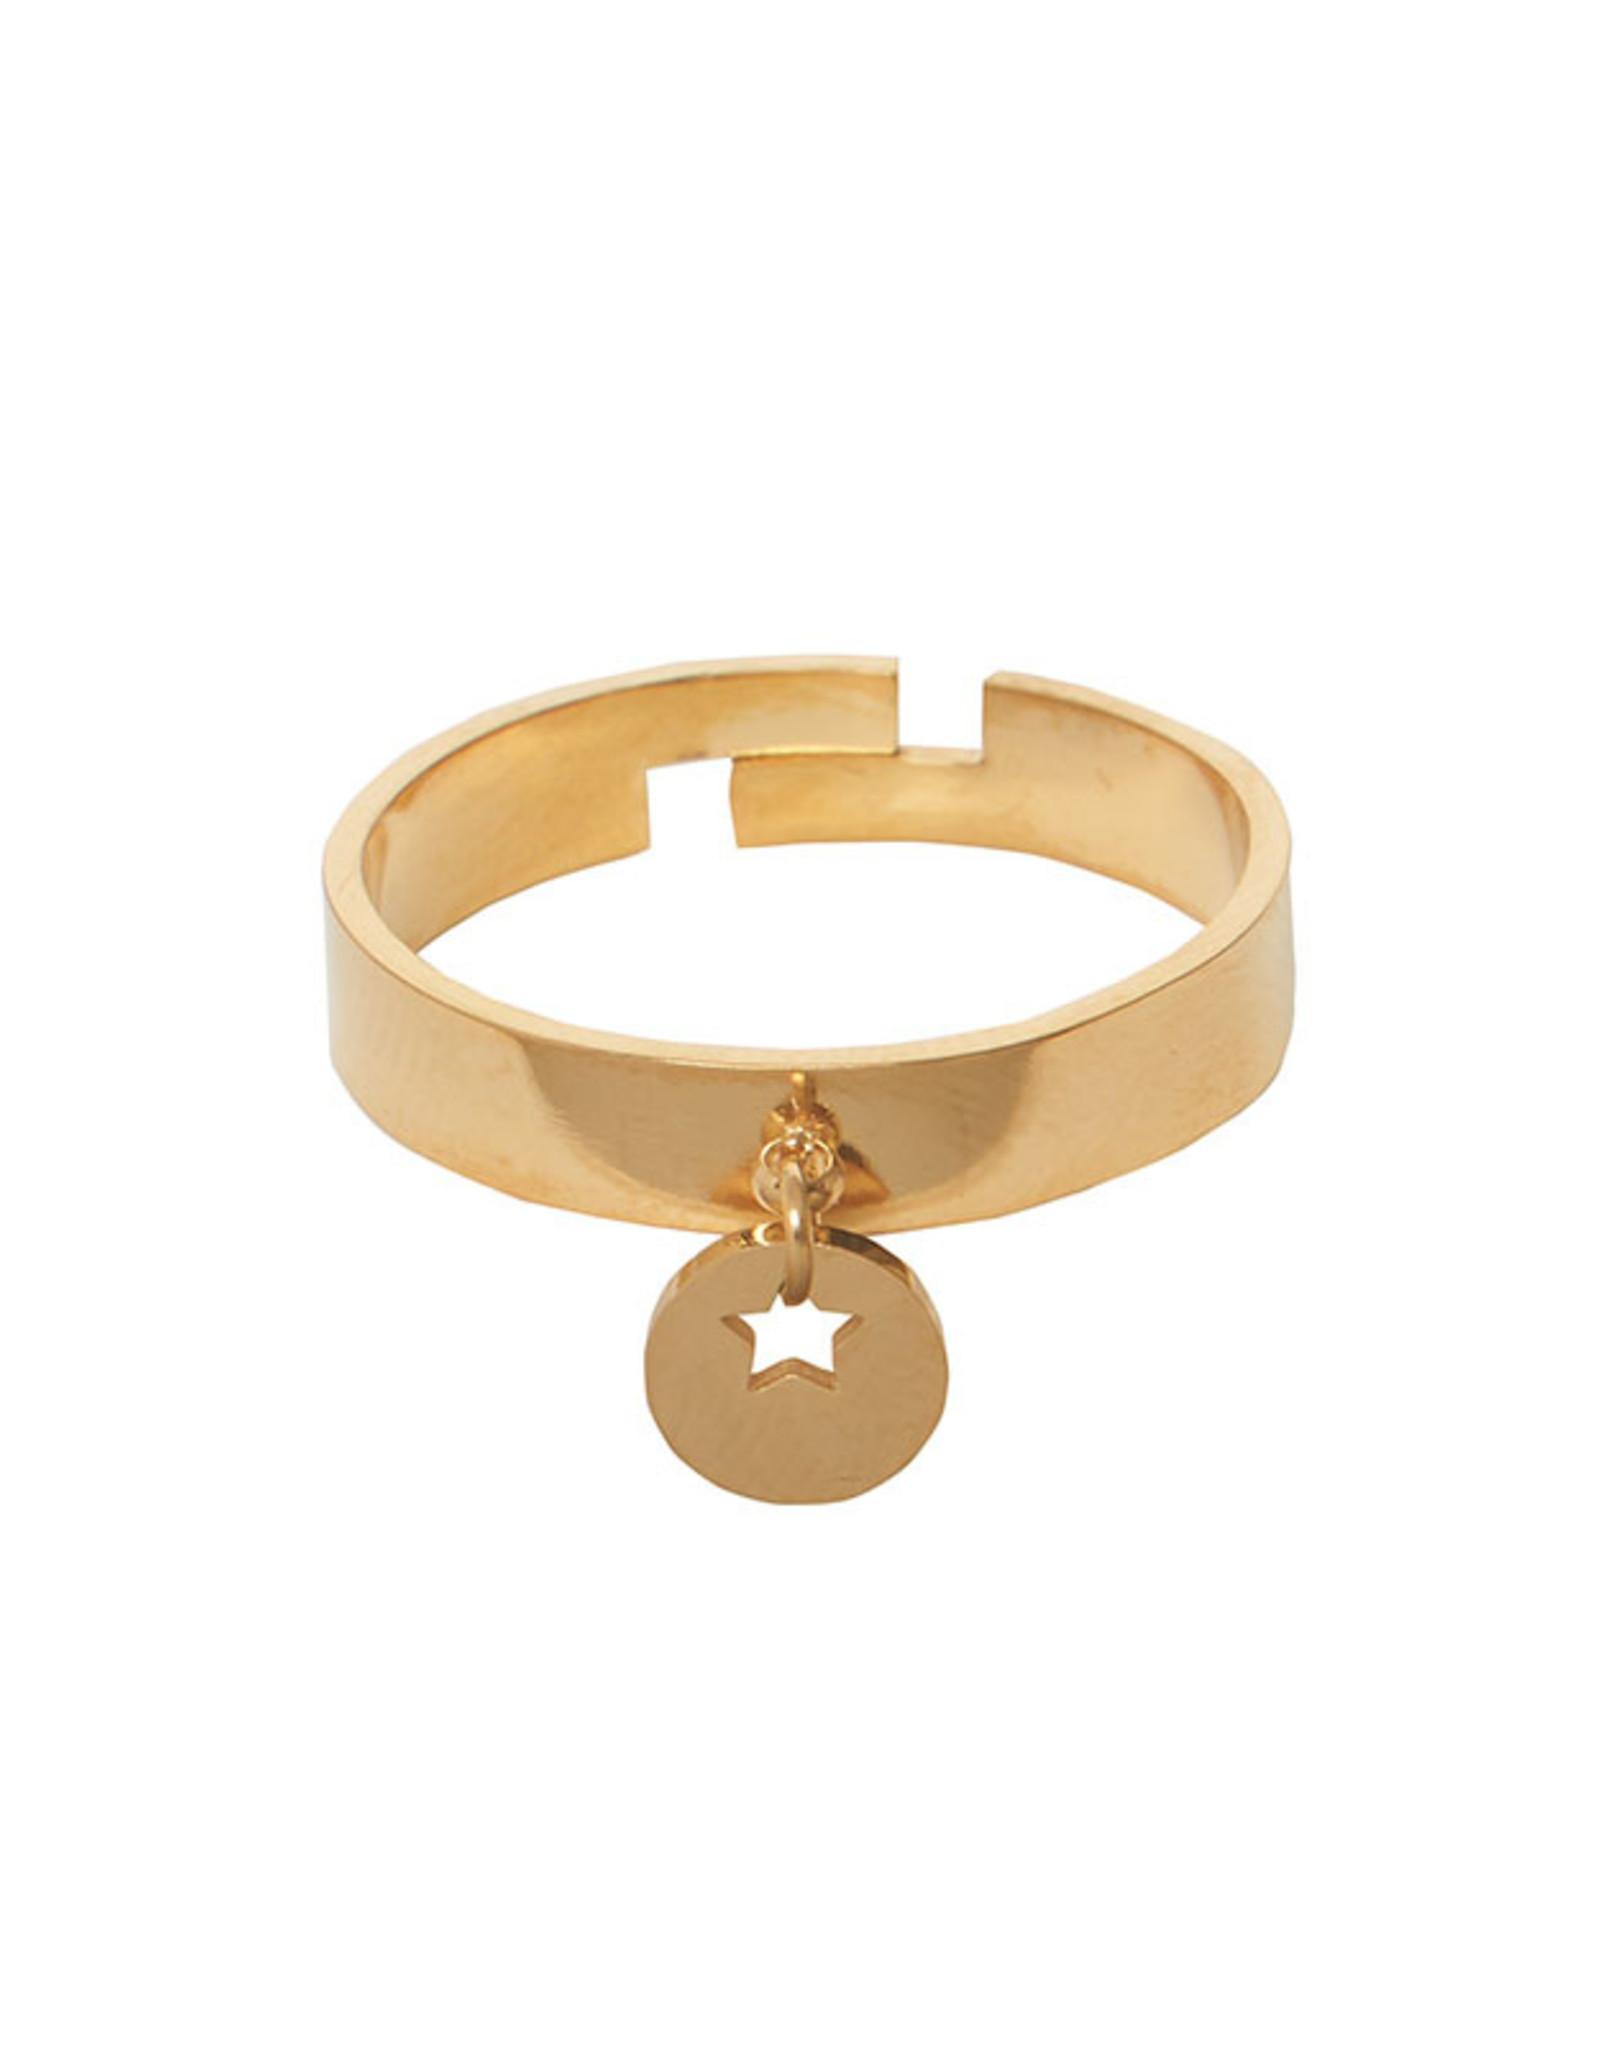 Ring Star : Fashion, Accessories